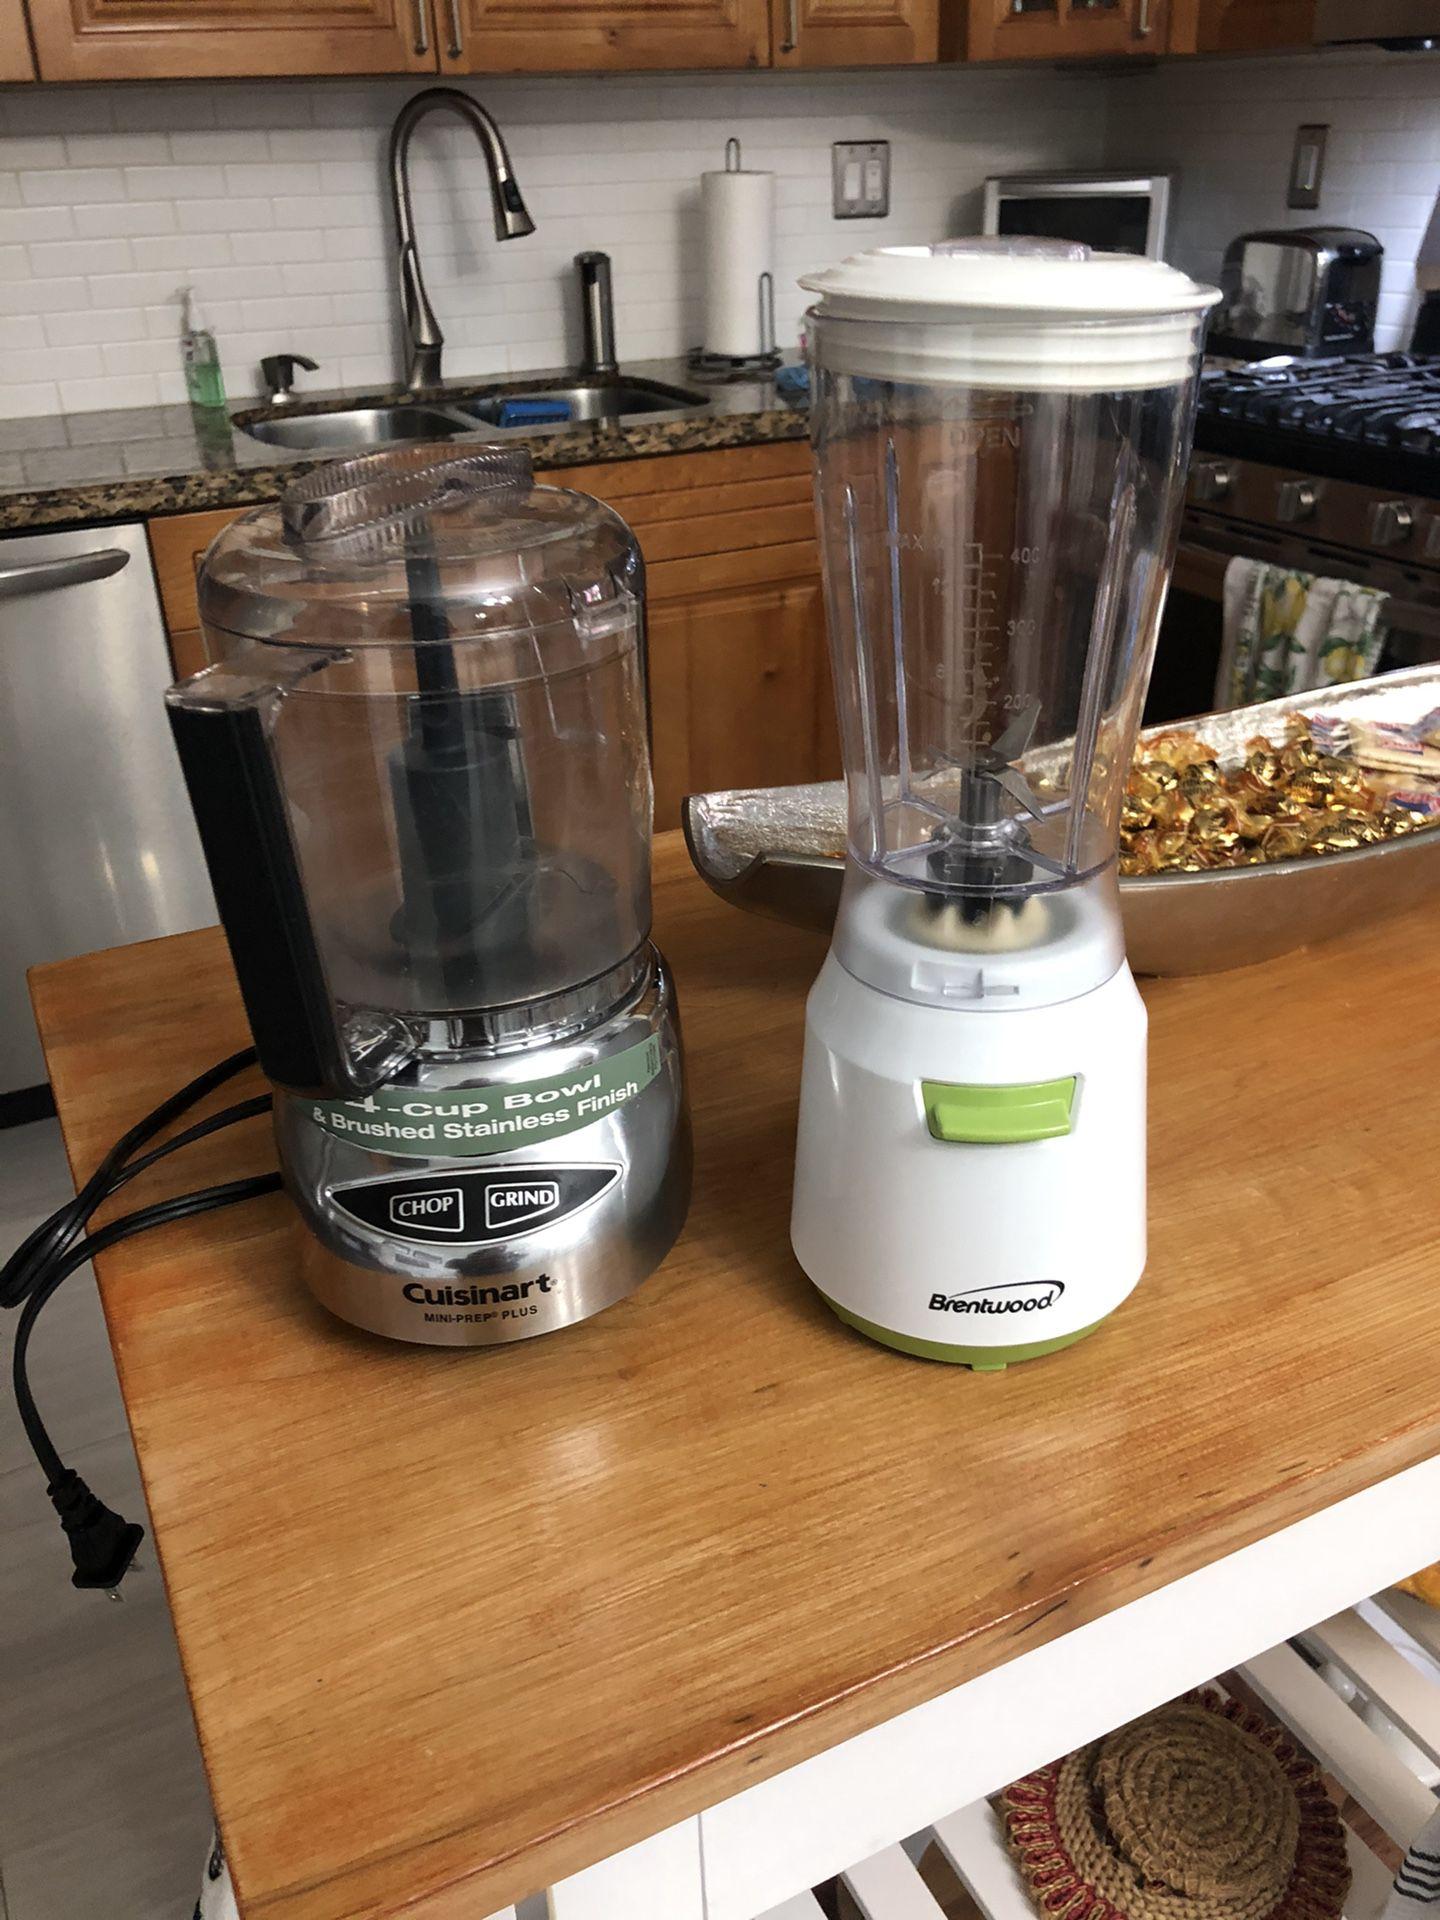 Personal mini blender and food processor